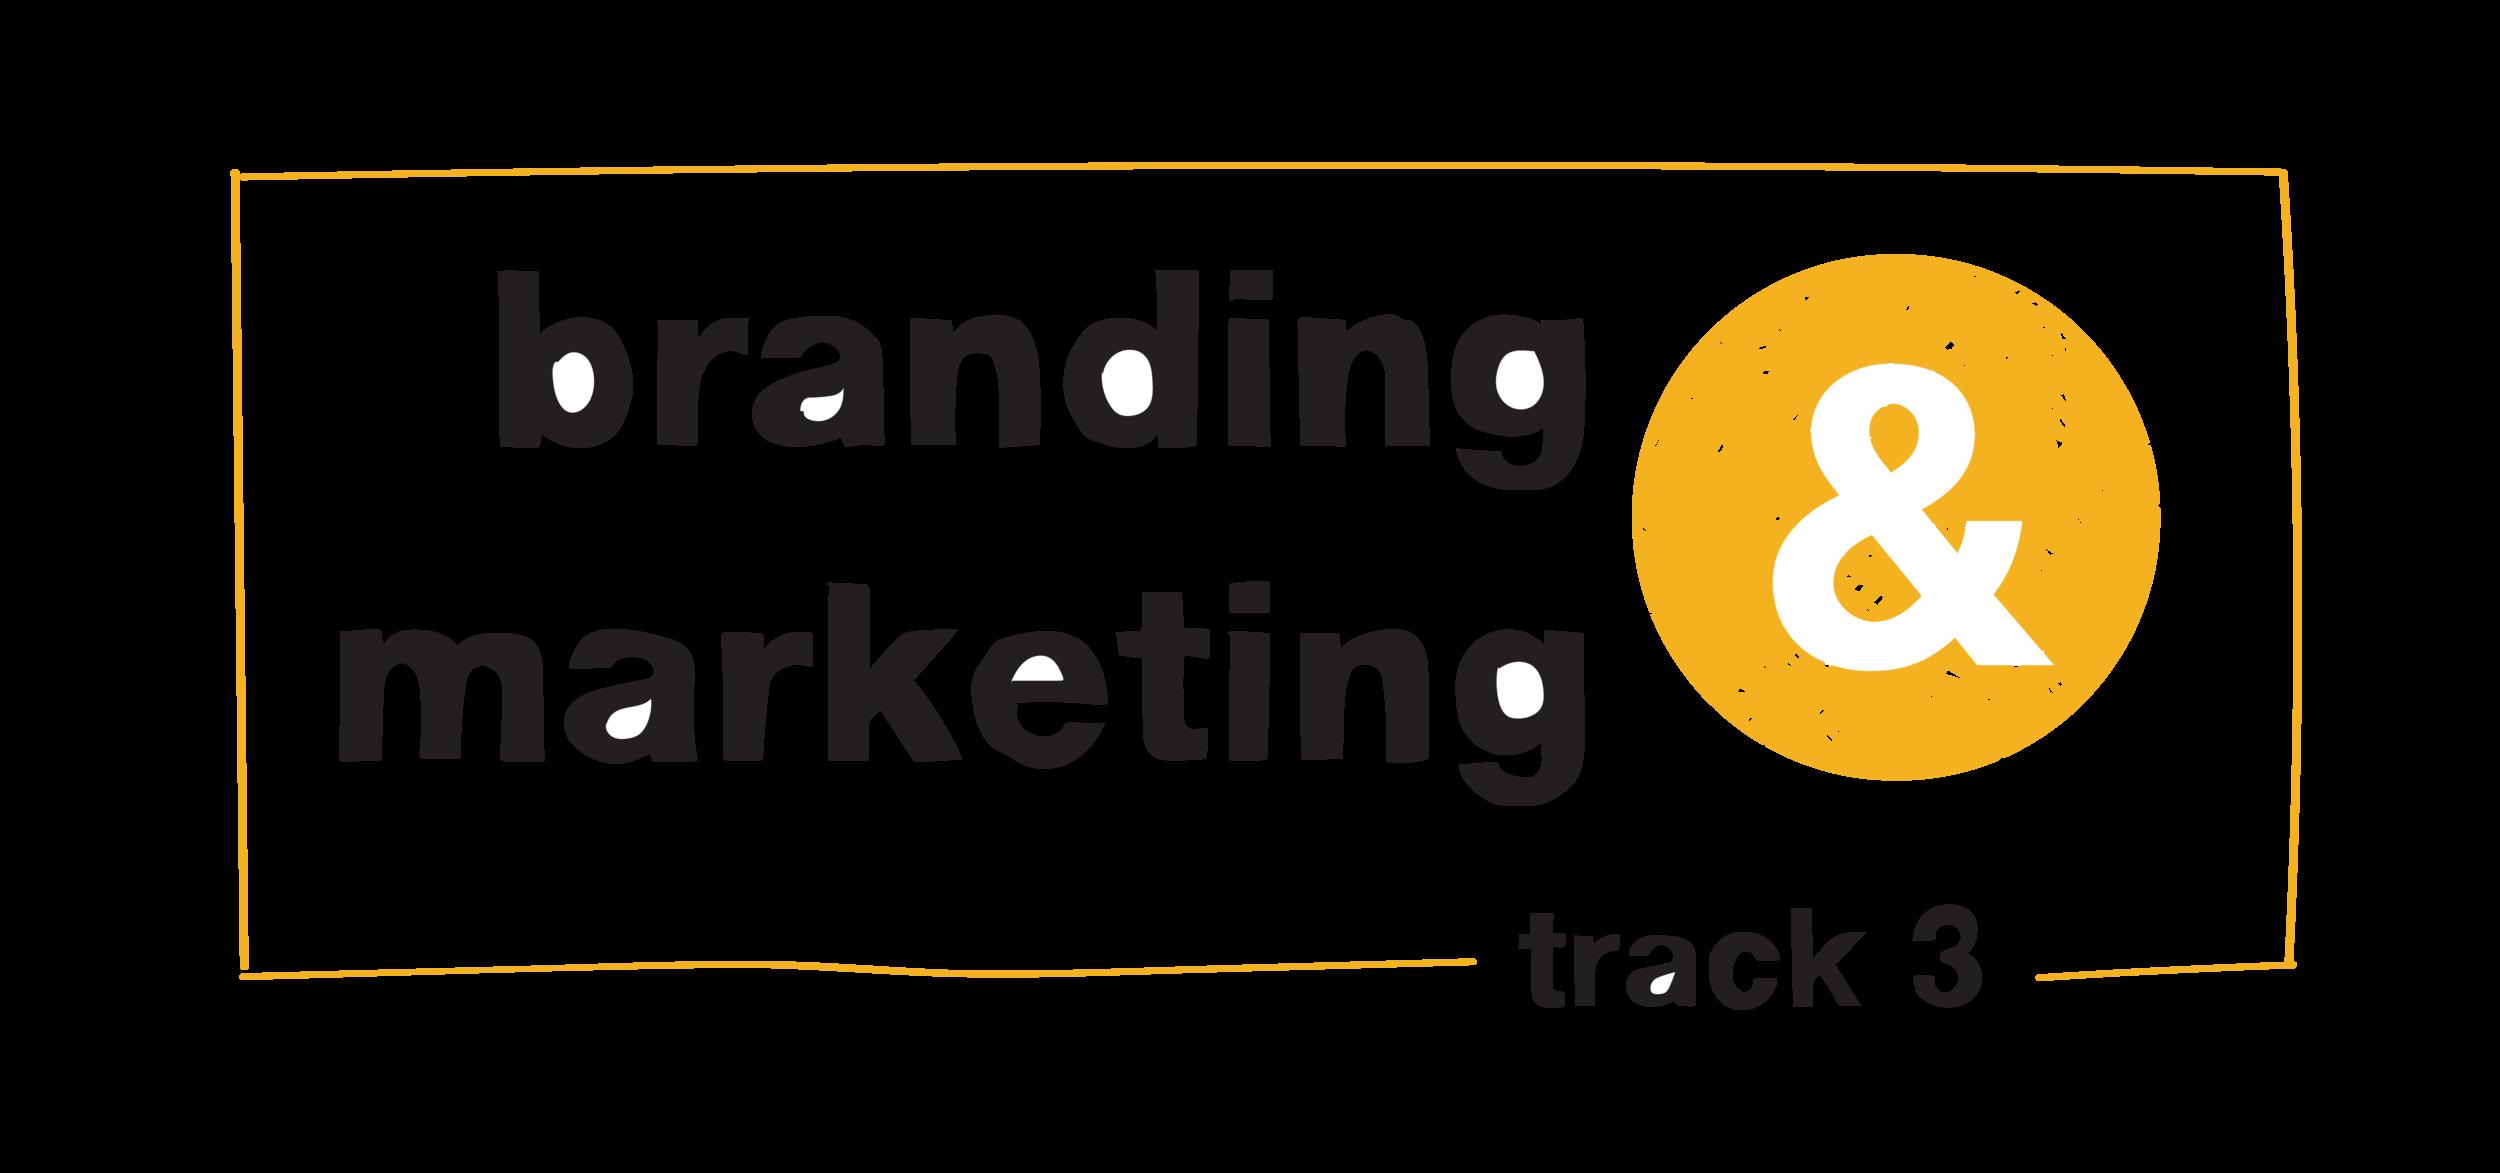 Rebranding Creativity_Tracks-12.png